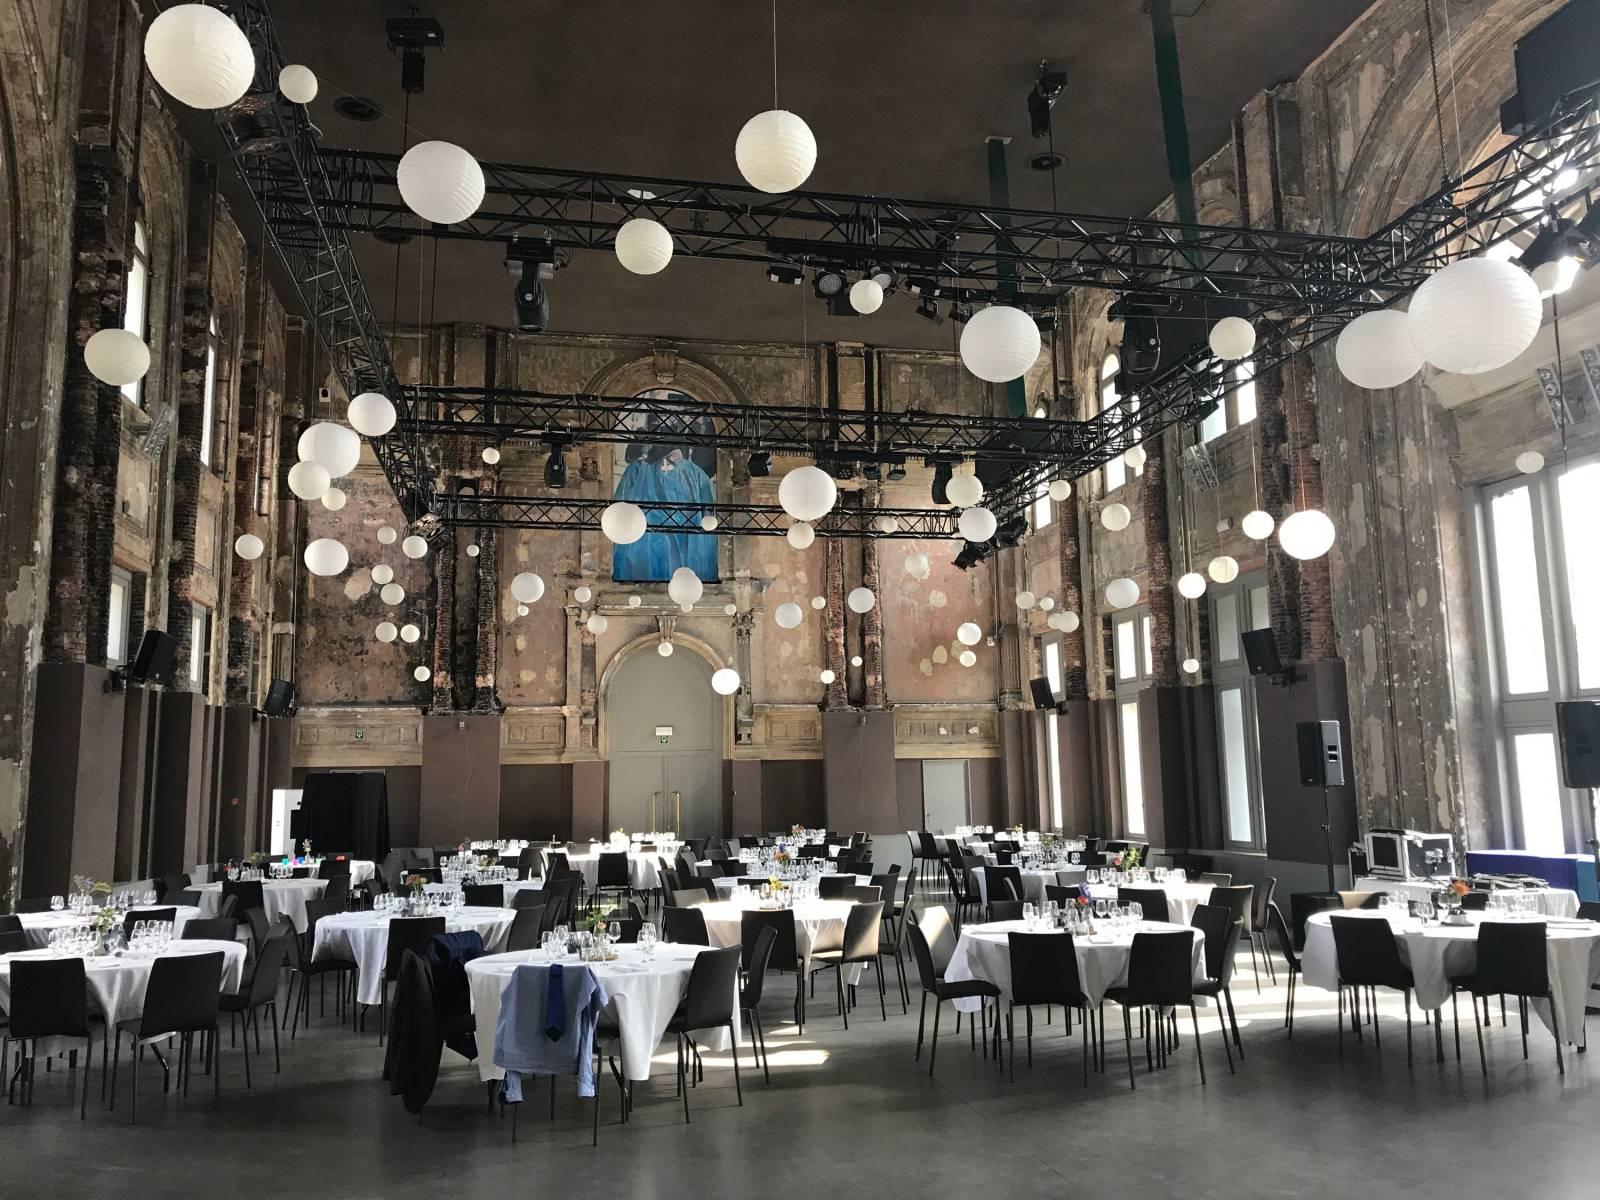 Zaal AthenA - Feestzaal - Trouwzaal - Antwerpen - House of Weddings - 28